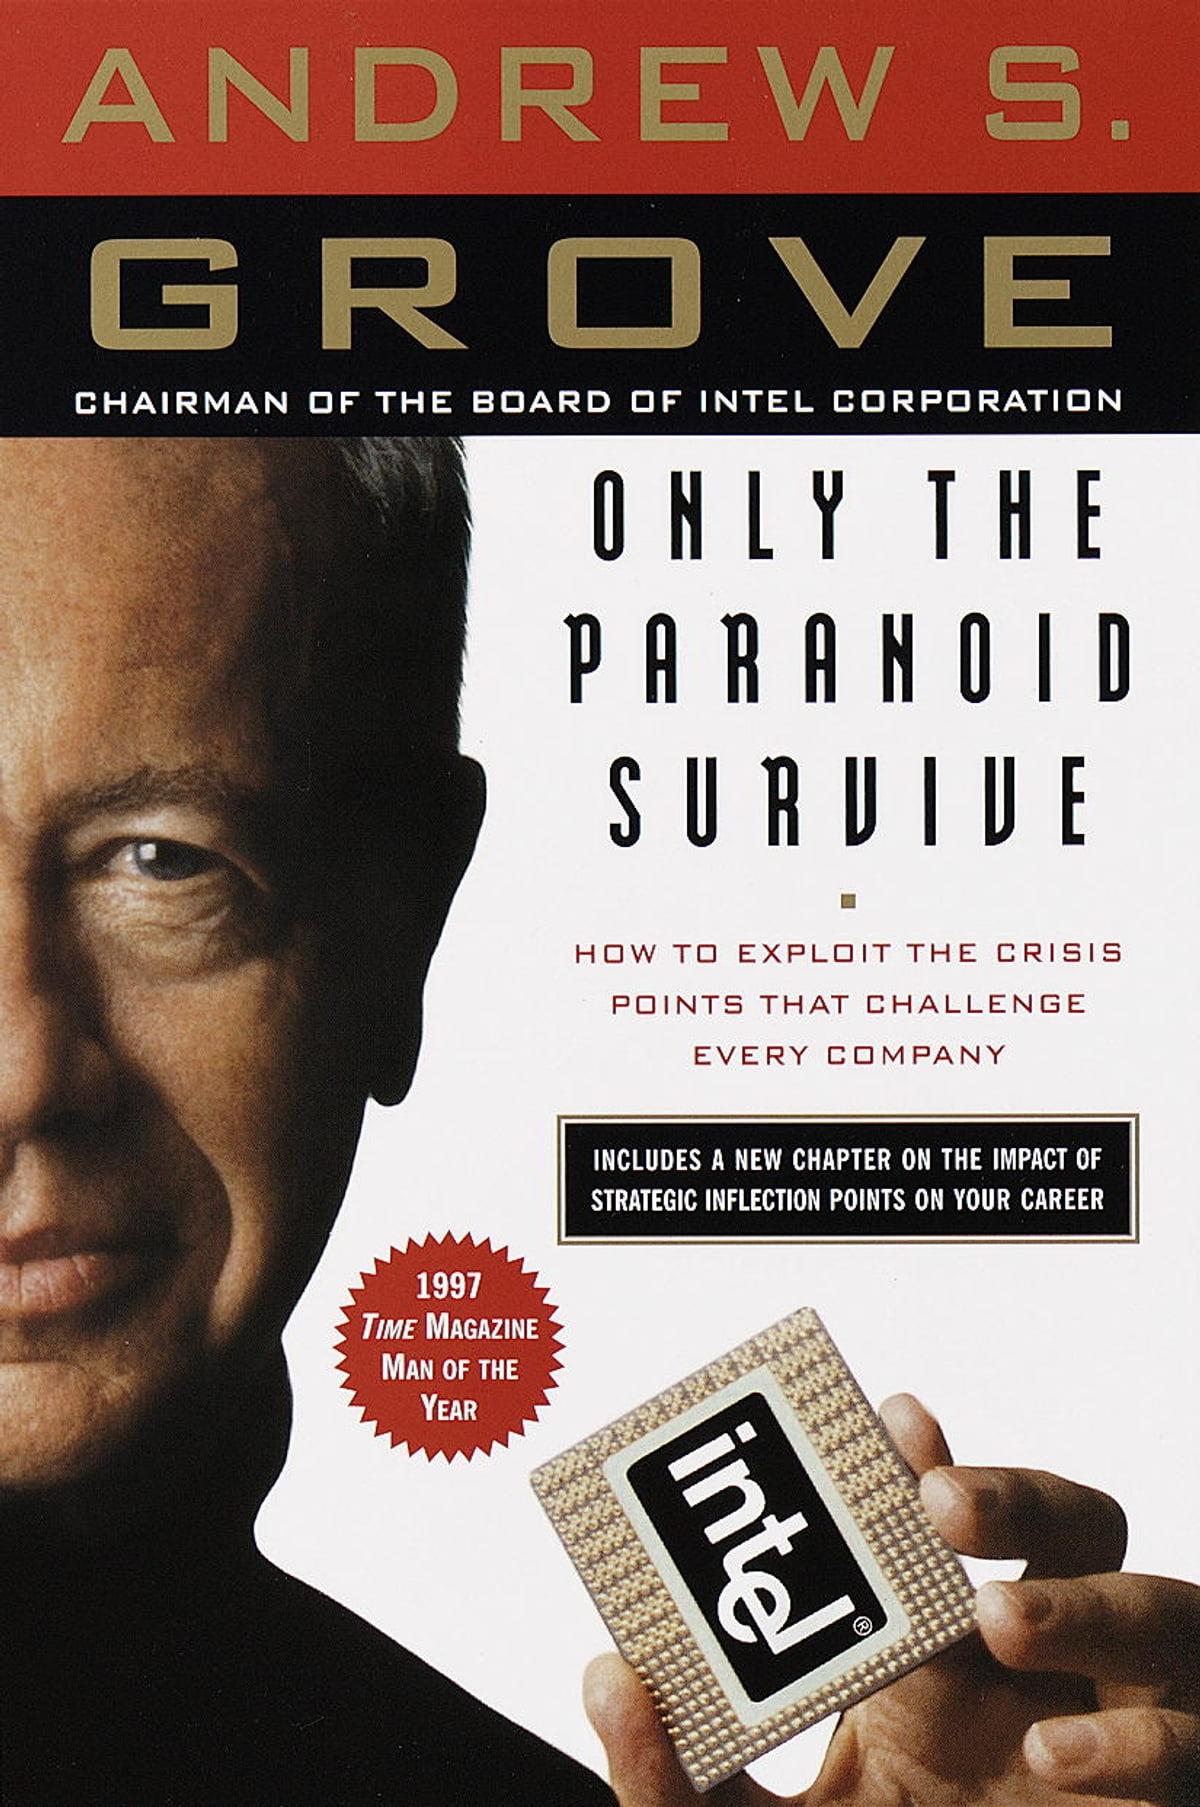 Only the Paranoid Survive eBook by Andrew S. Grove - 9780307574978   Rakuten Kobo